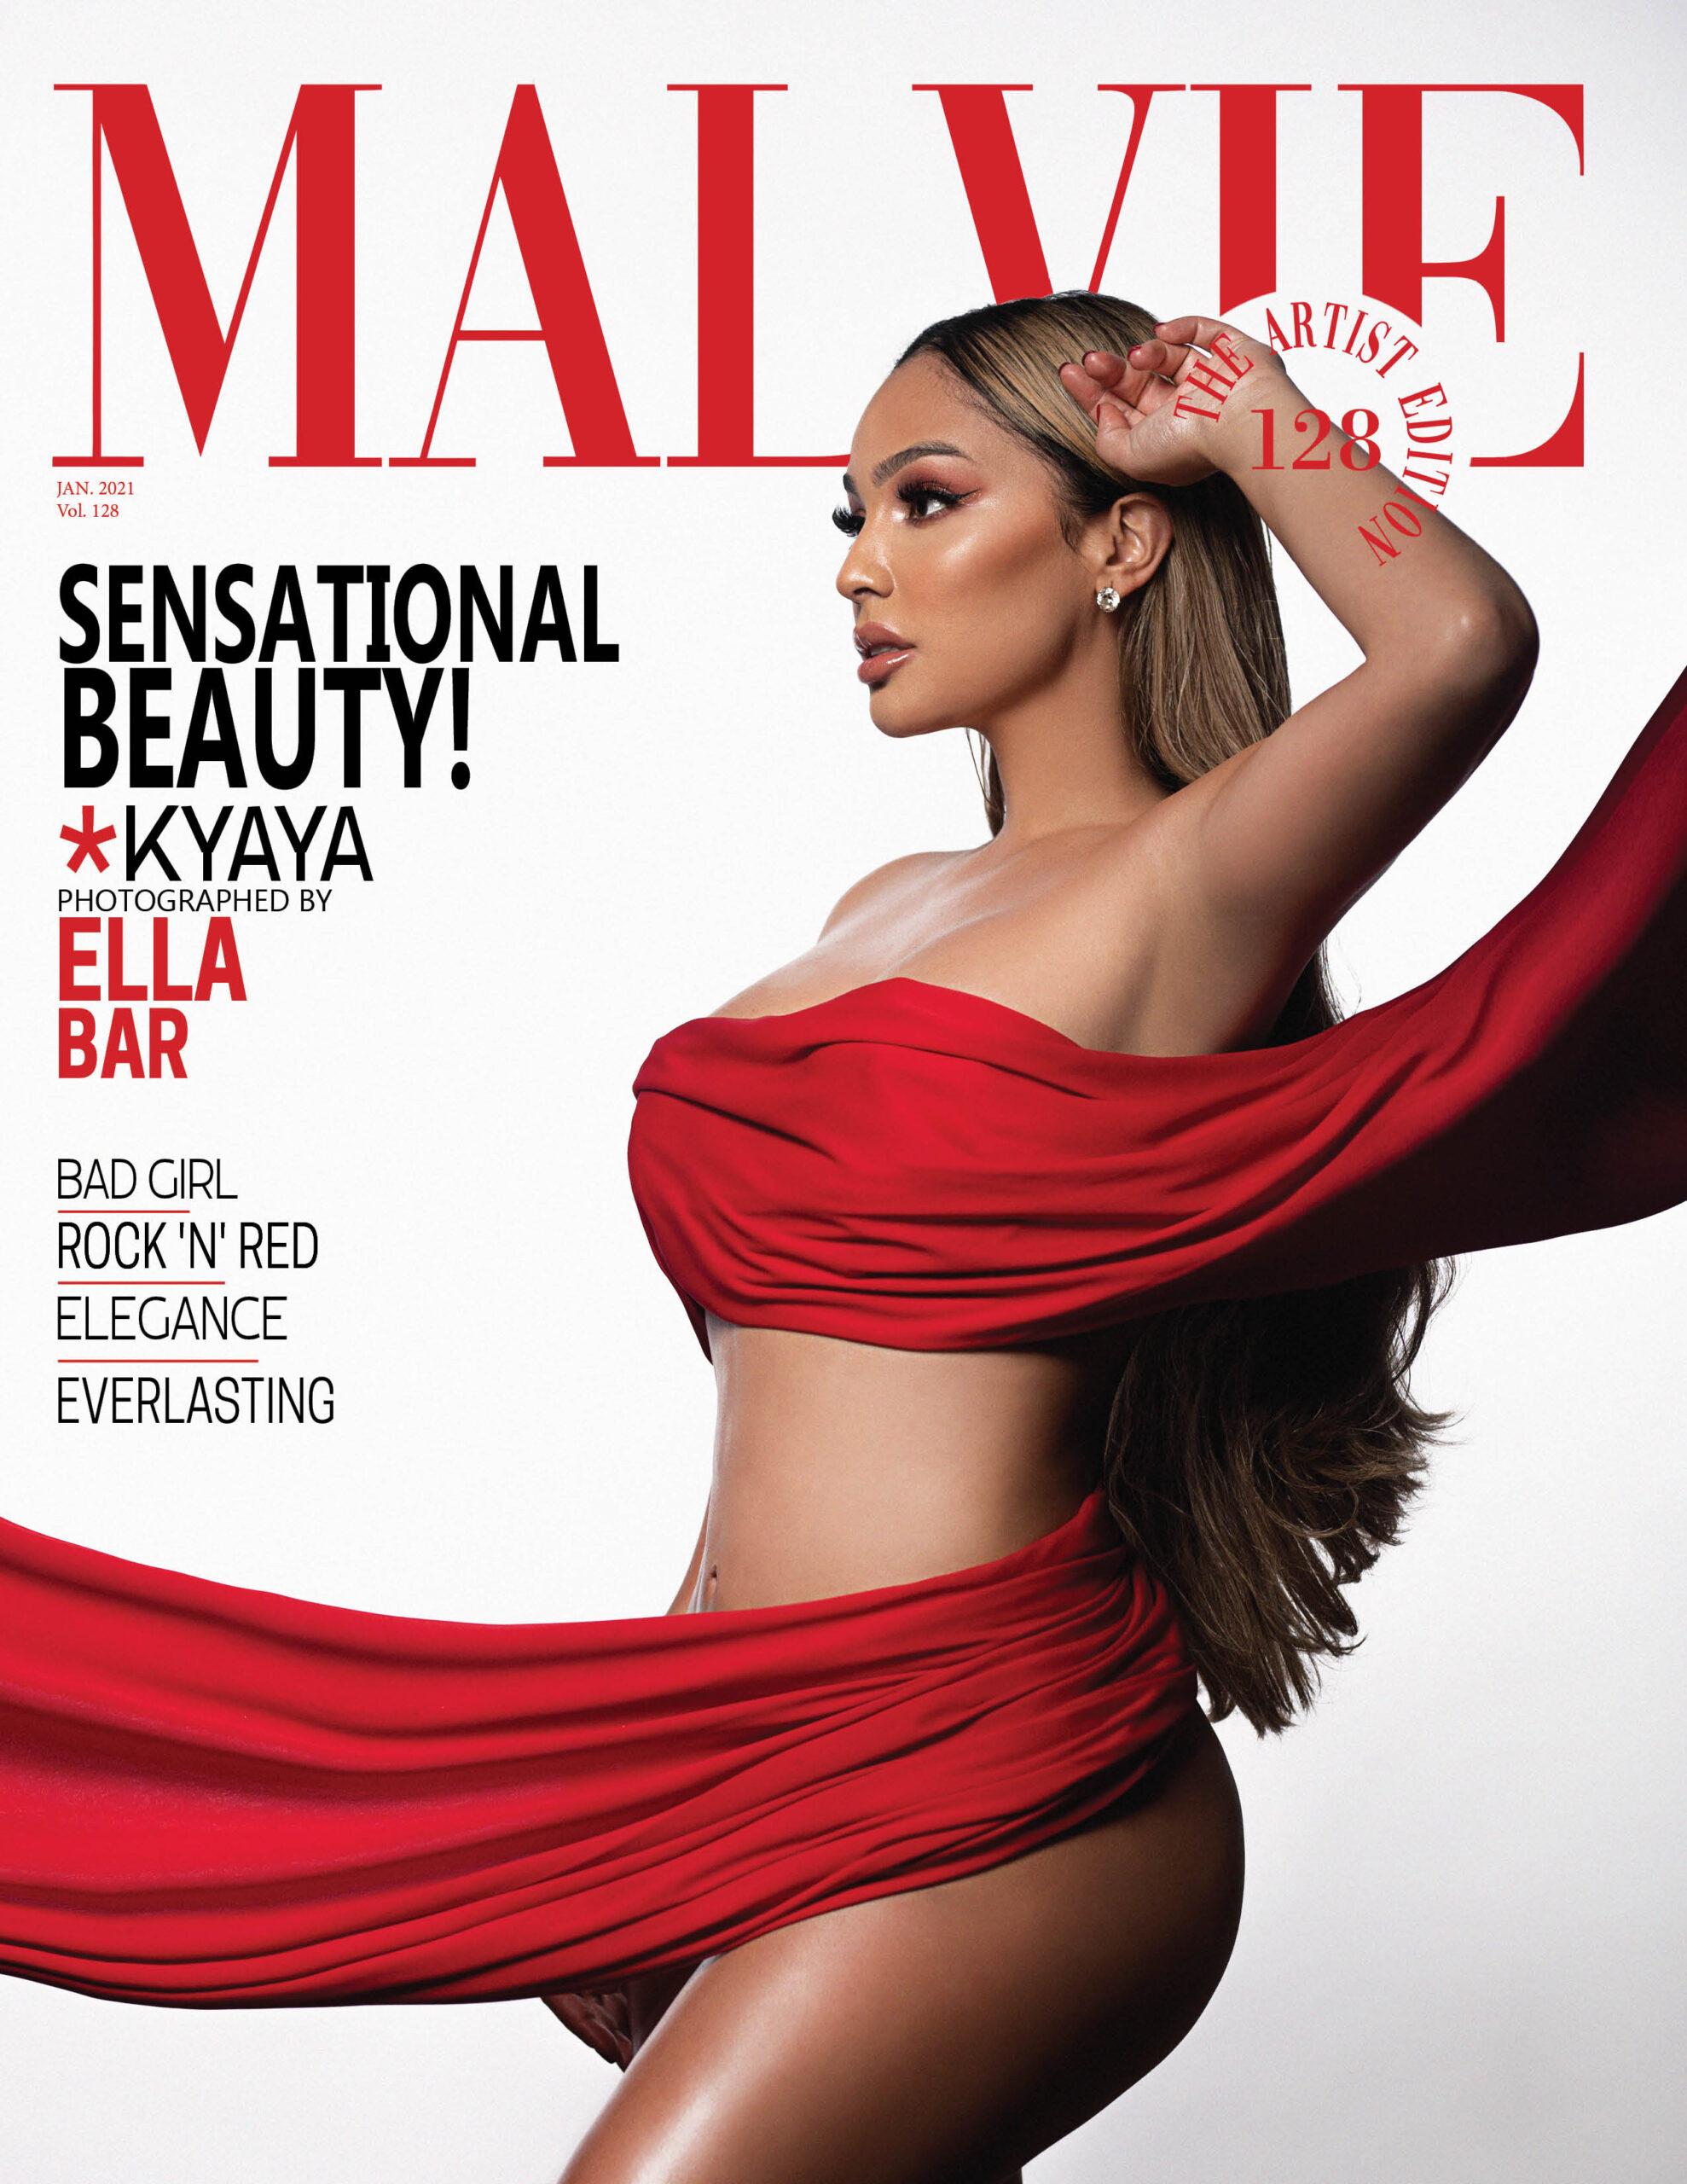 MALVIE Magazine The Artist Edition Vol 128 January 2021